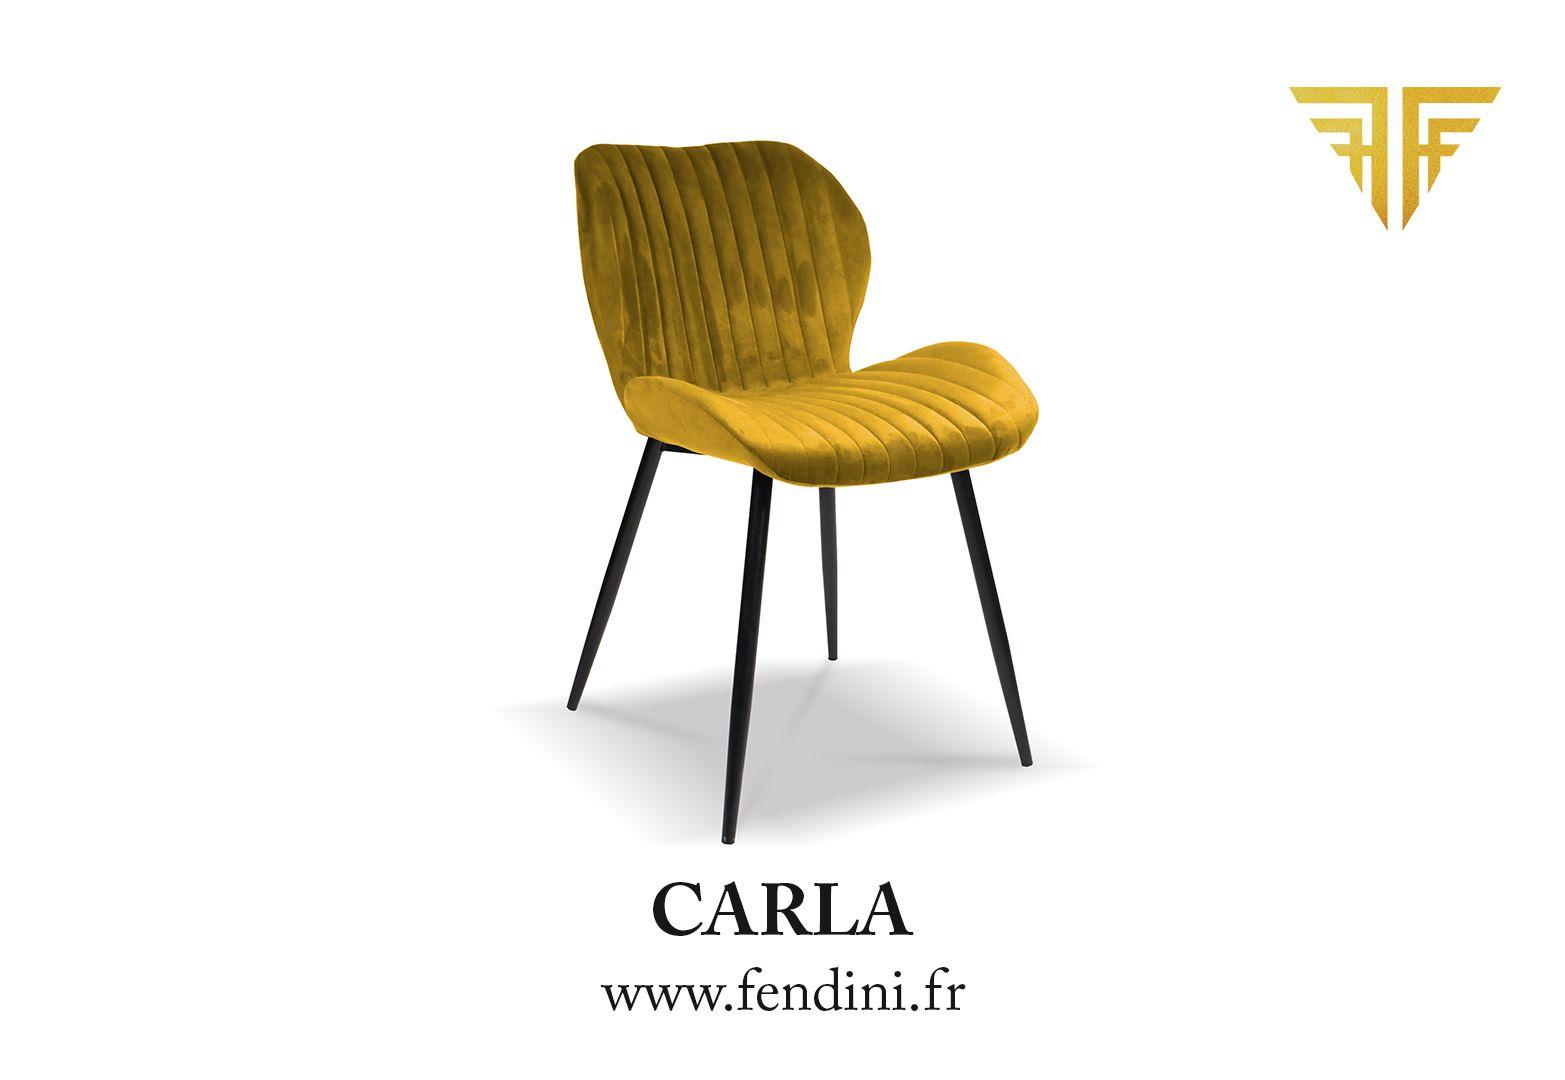 Chaise Velours Carla Jaune Moutarde By Fendini Disponible En Plusieurs Coloris Fendini Fendinihome Design Concept Designe Chaise Retro Chic Deco Addict